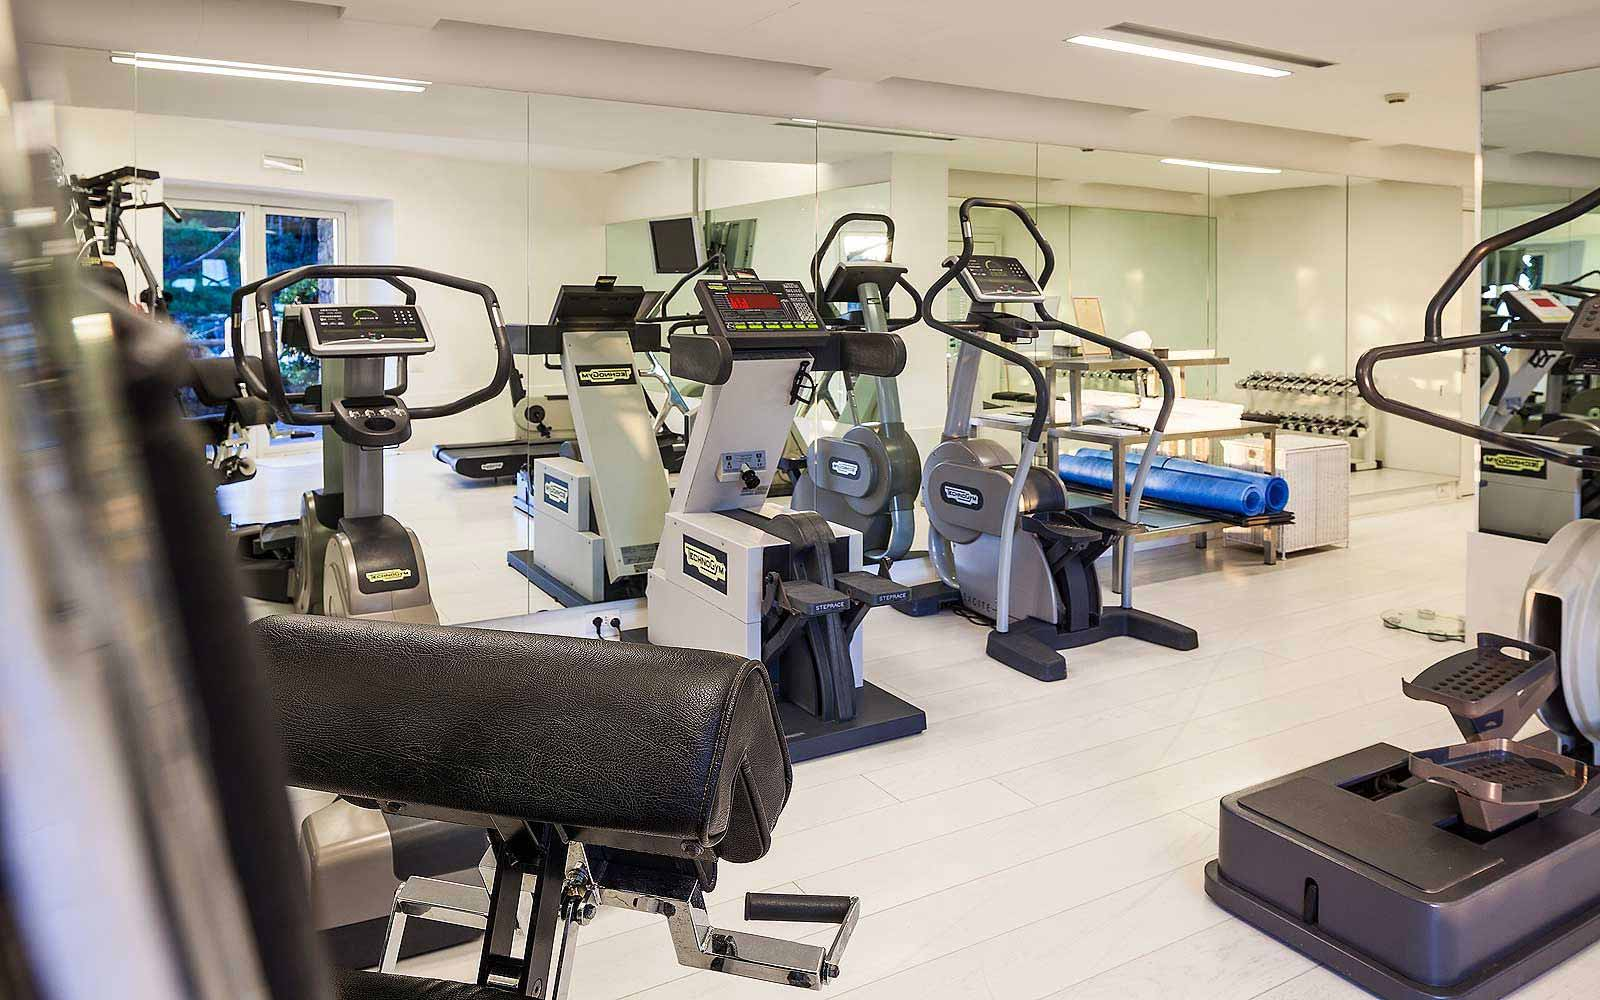 Gym at Mezzatorre Resort & Spa